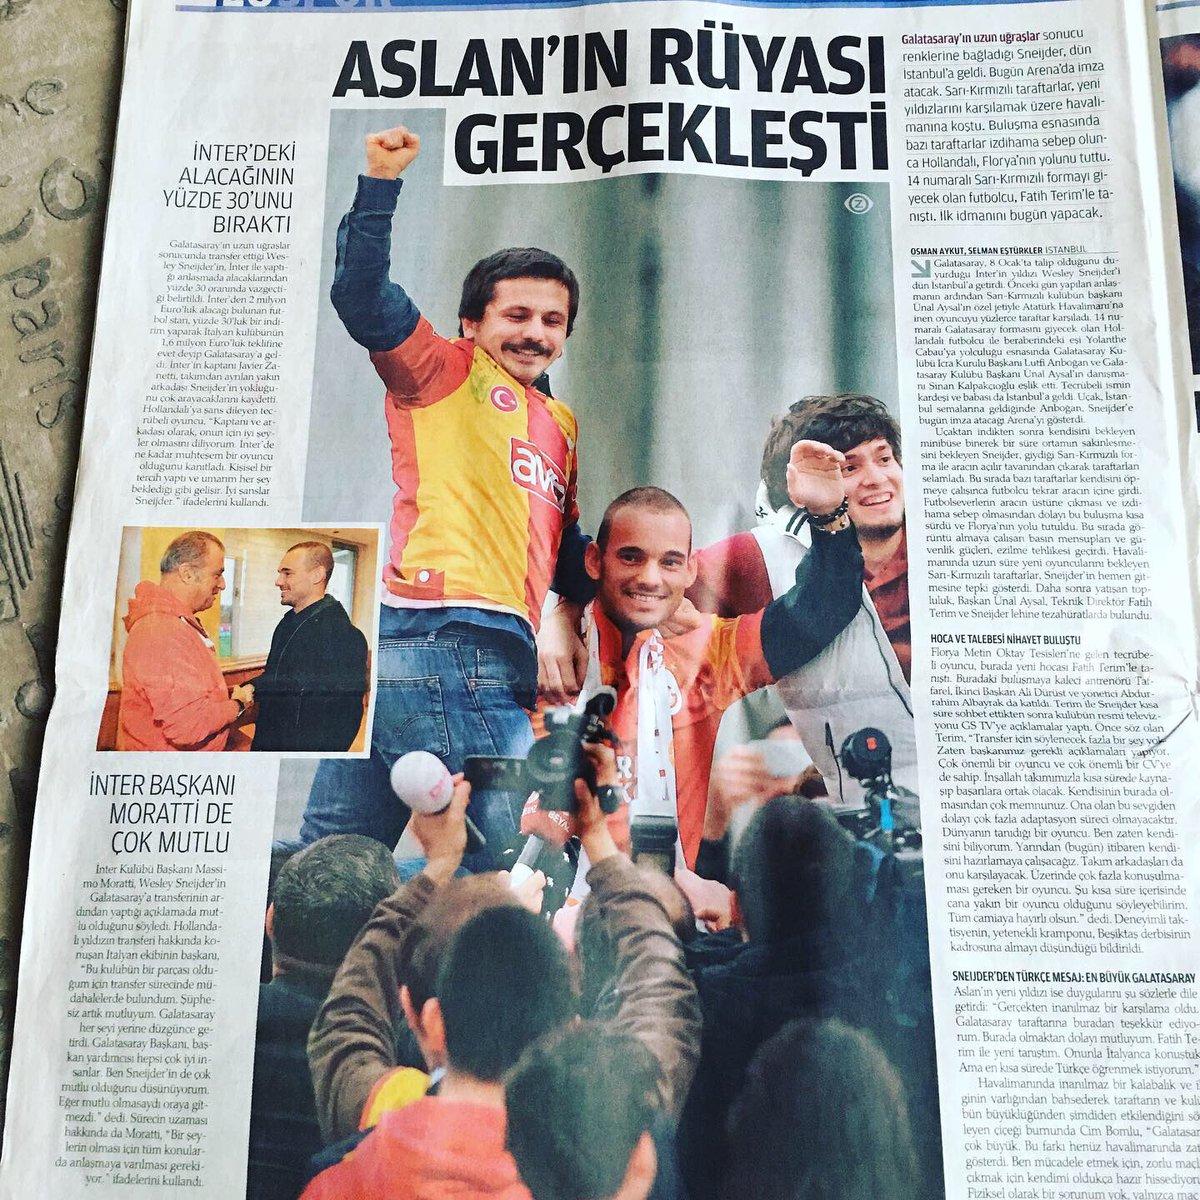 #galatasaray #GalatasaraySK #ultraaslan  #fatihterim #KupaBeyiGalatasaray https://t.co/Z042MLsAWv